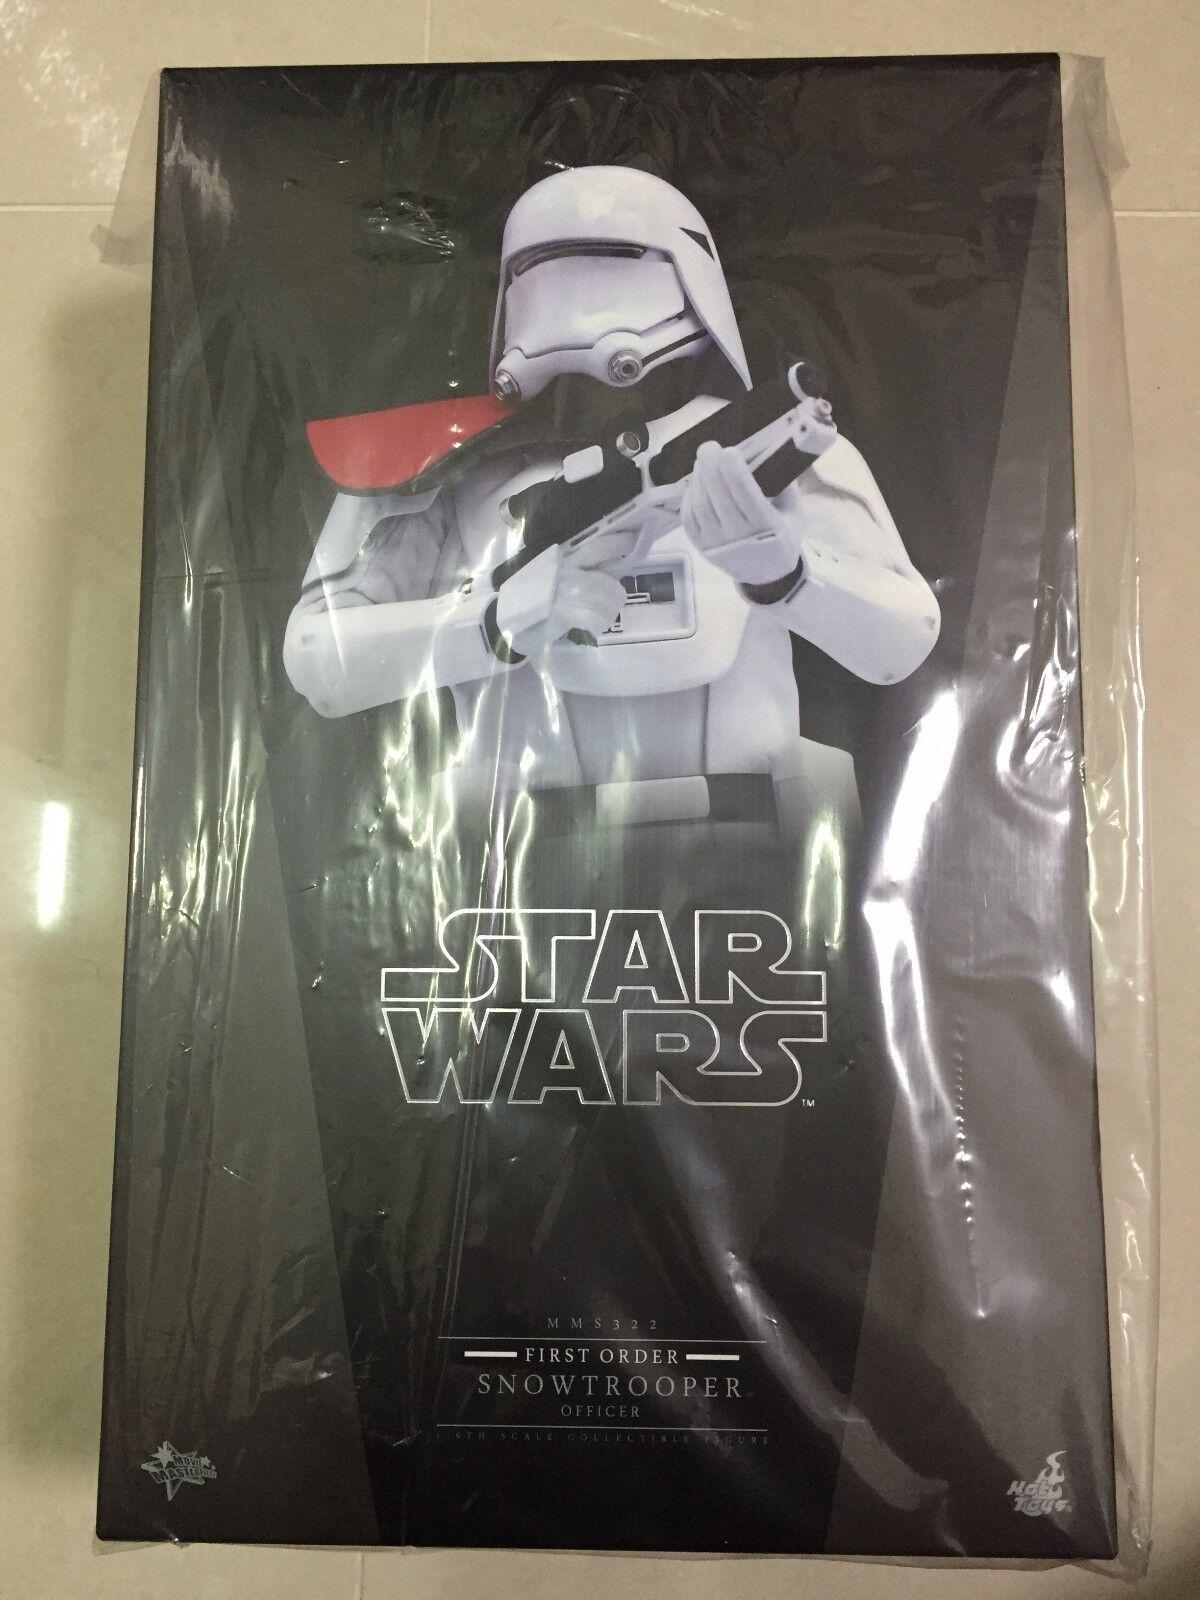 Hot Toys MMS 322 Star Wars Force despierta primera orden Snowtrooper oficial nuevo